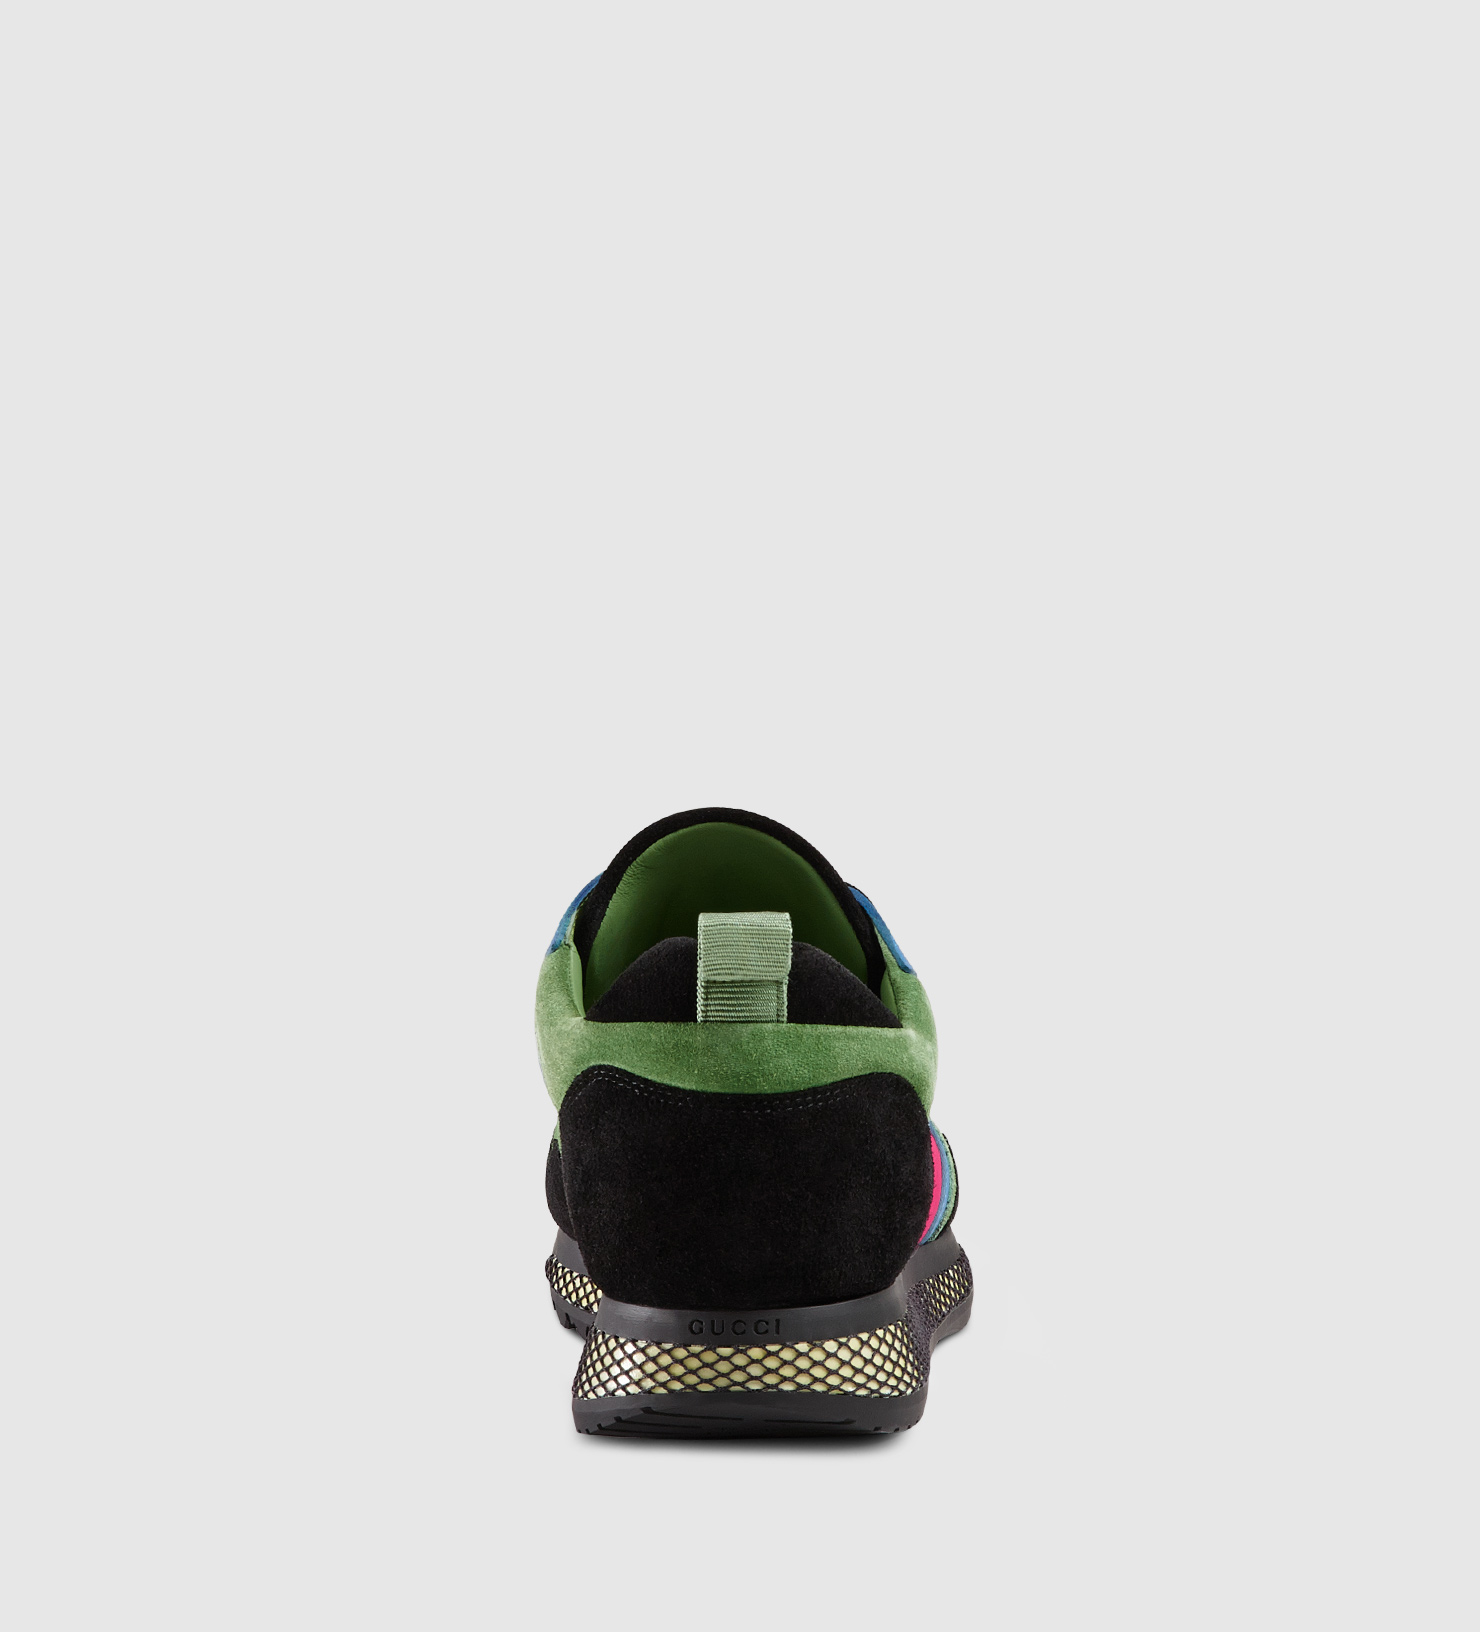 b81edcdf6 Gucci Contrast Combo Low-top Sneaker in Black for Men - Lyst